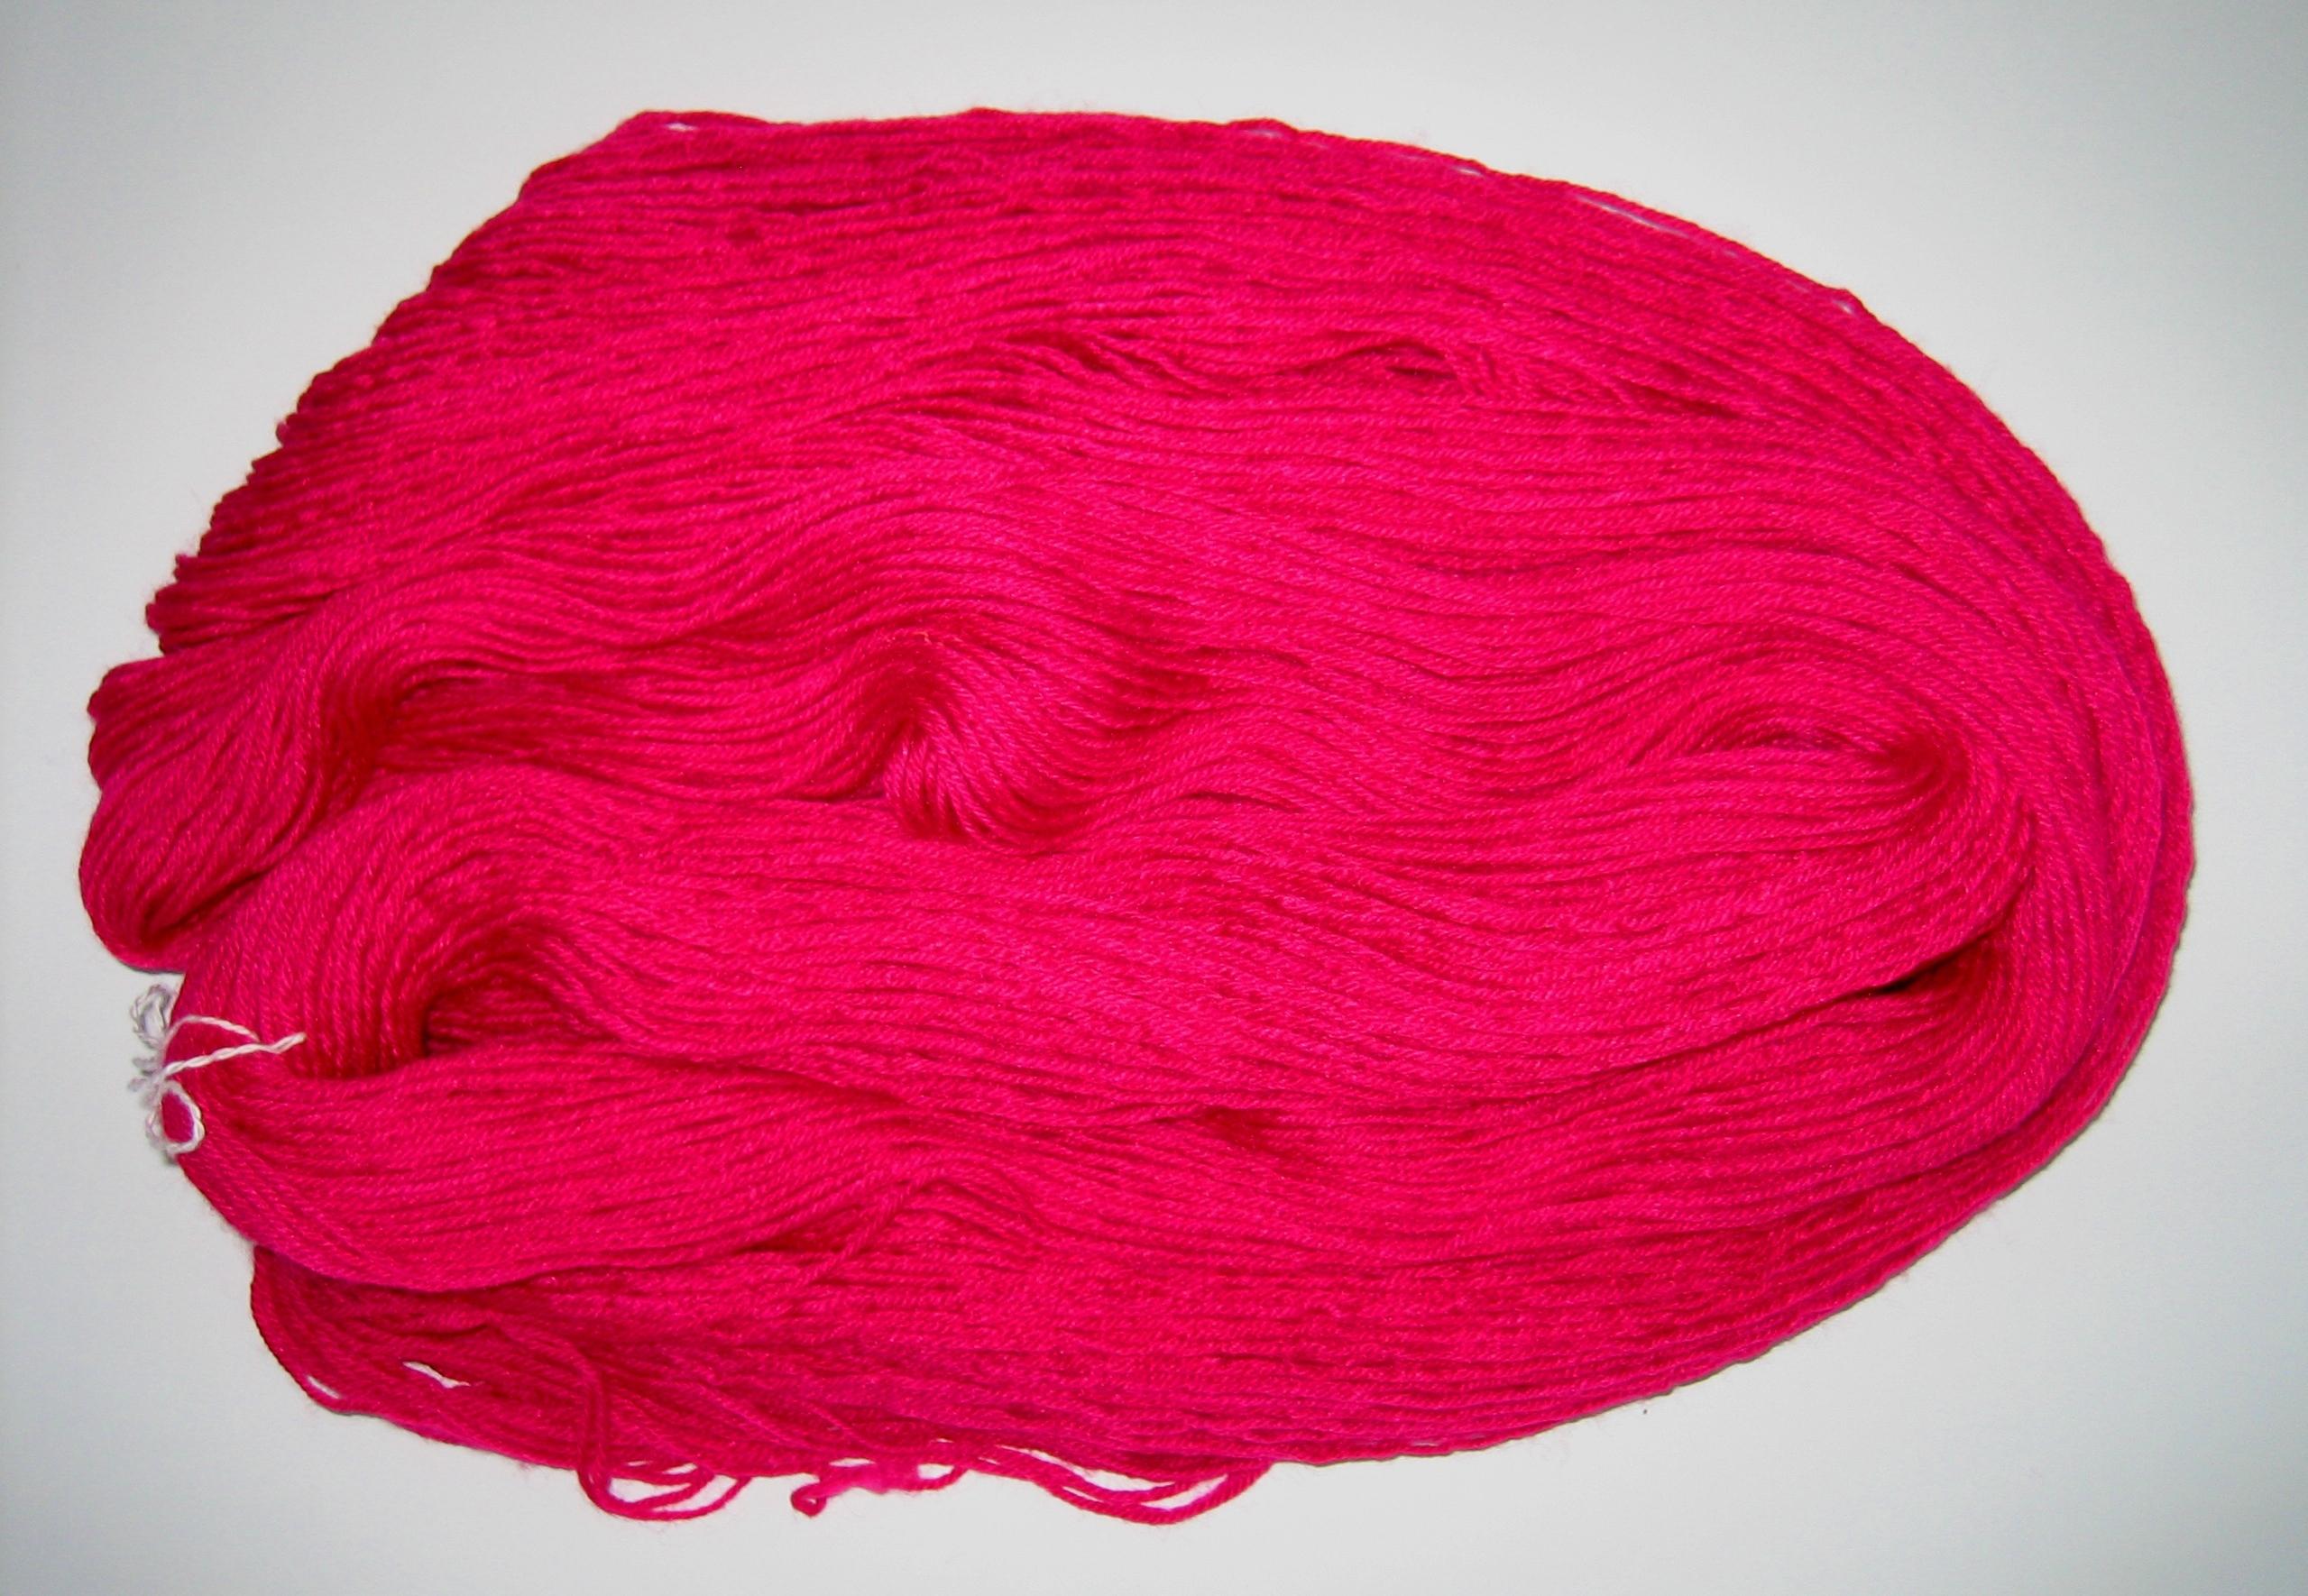 garnyarn-håndfarvet-garn-tynd-merino-nylon-heritage-moerkpink